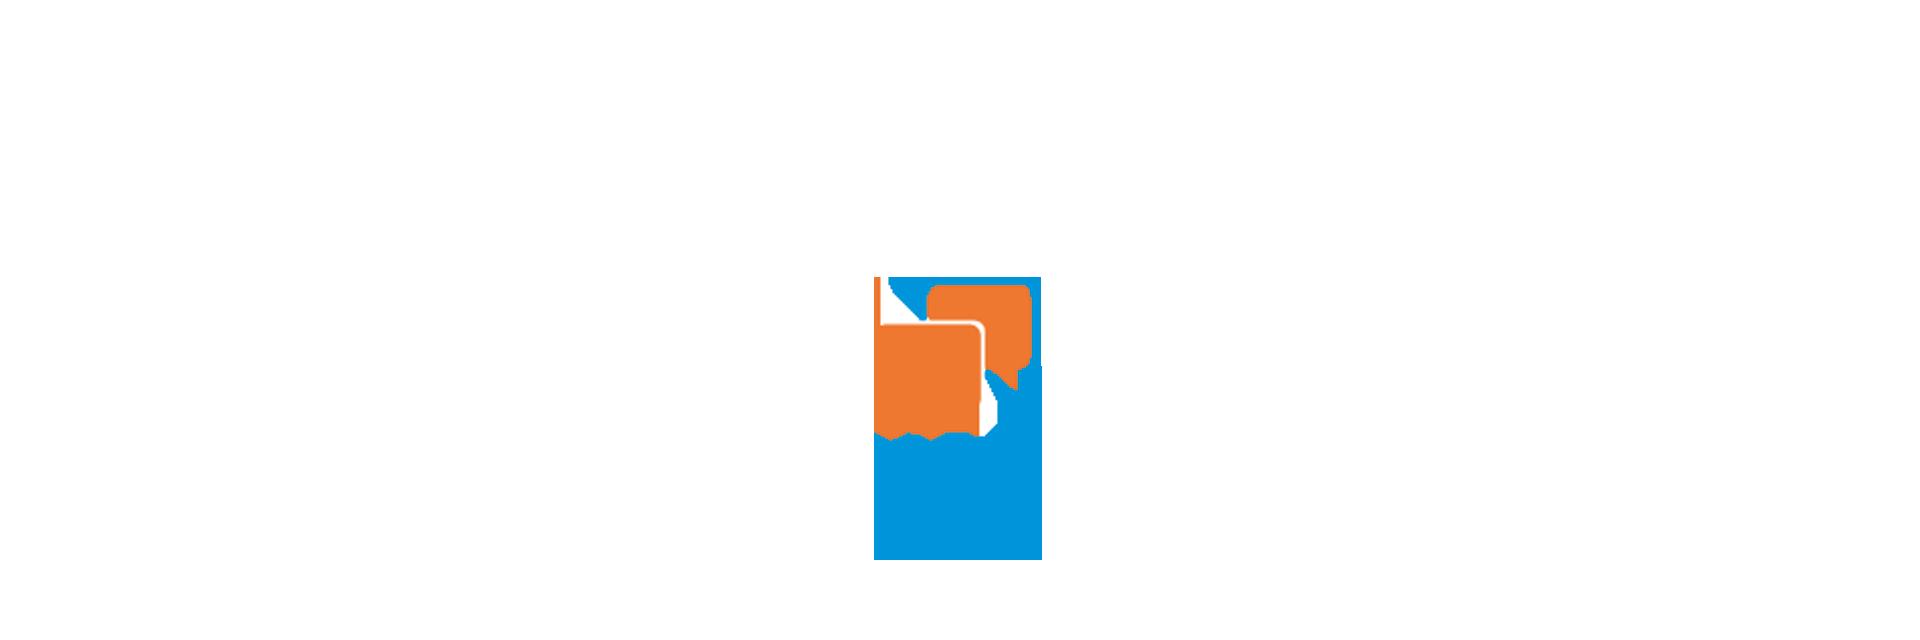 Social-Media-Marketing-Best-Practices-Whitepaper